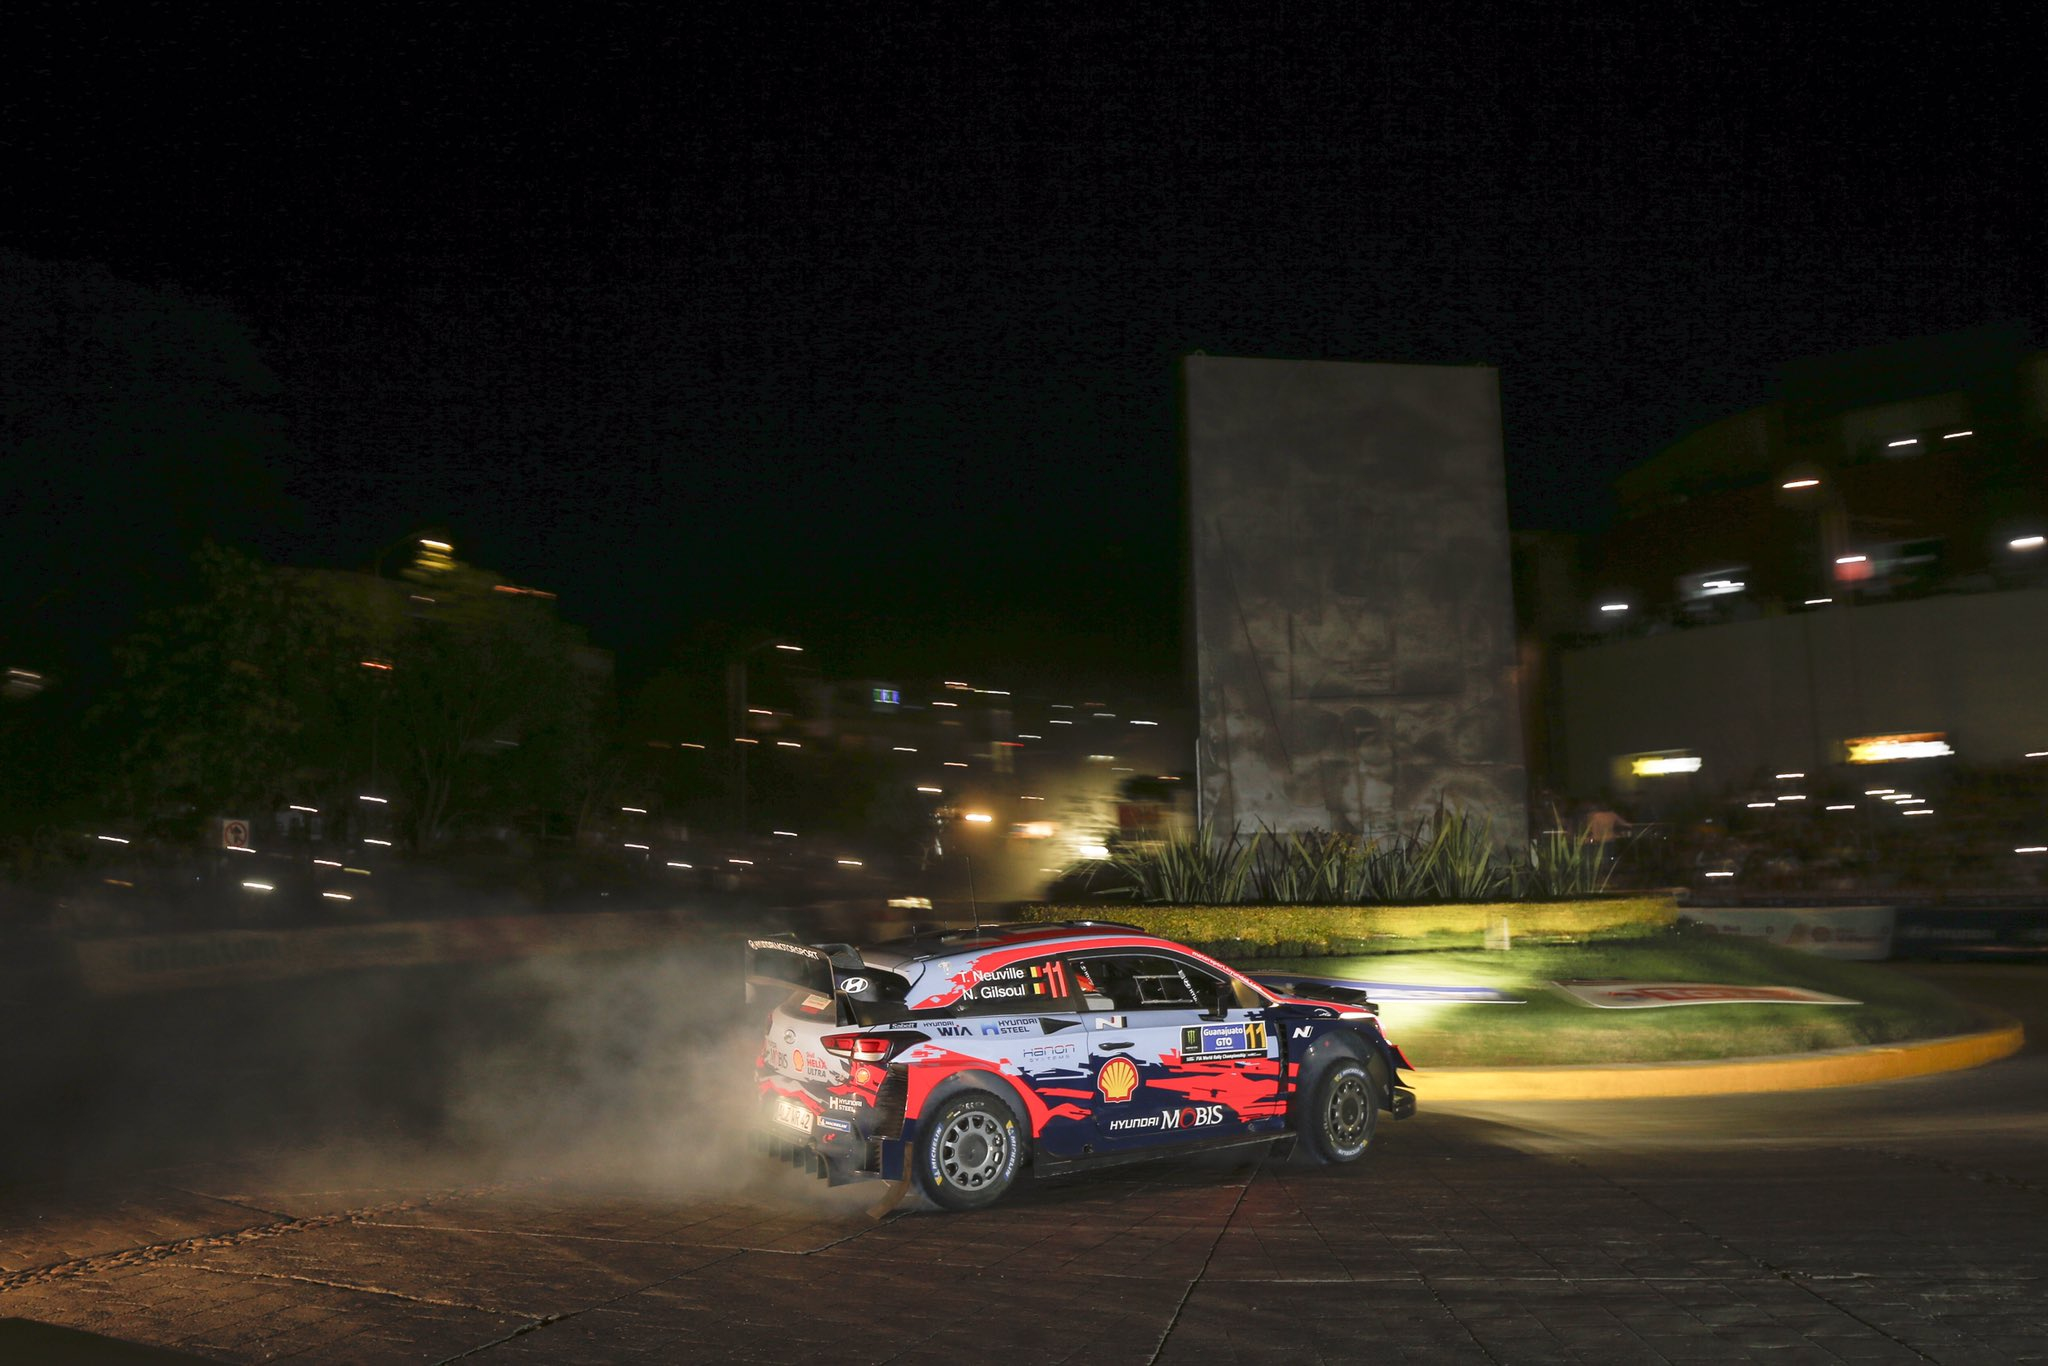 WRC: 17º Rallye Guanajuato Corona - México [12-15 Marzo] - Página 2 ES-Hpo5XYAEcxFg?format=jpg&name=large